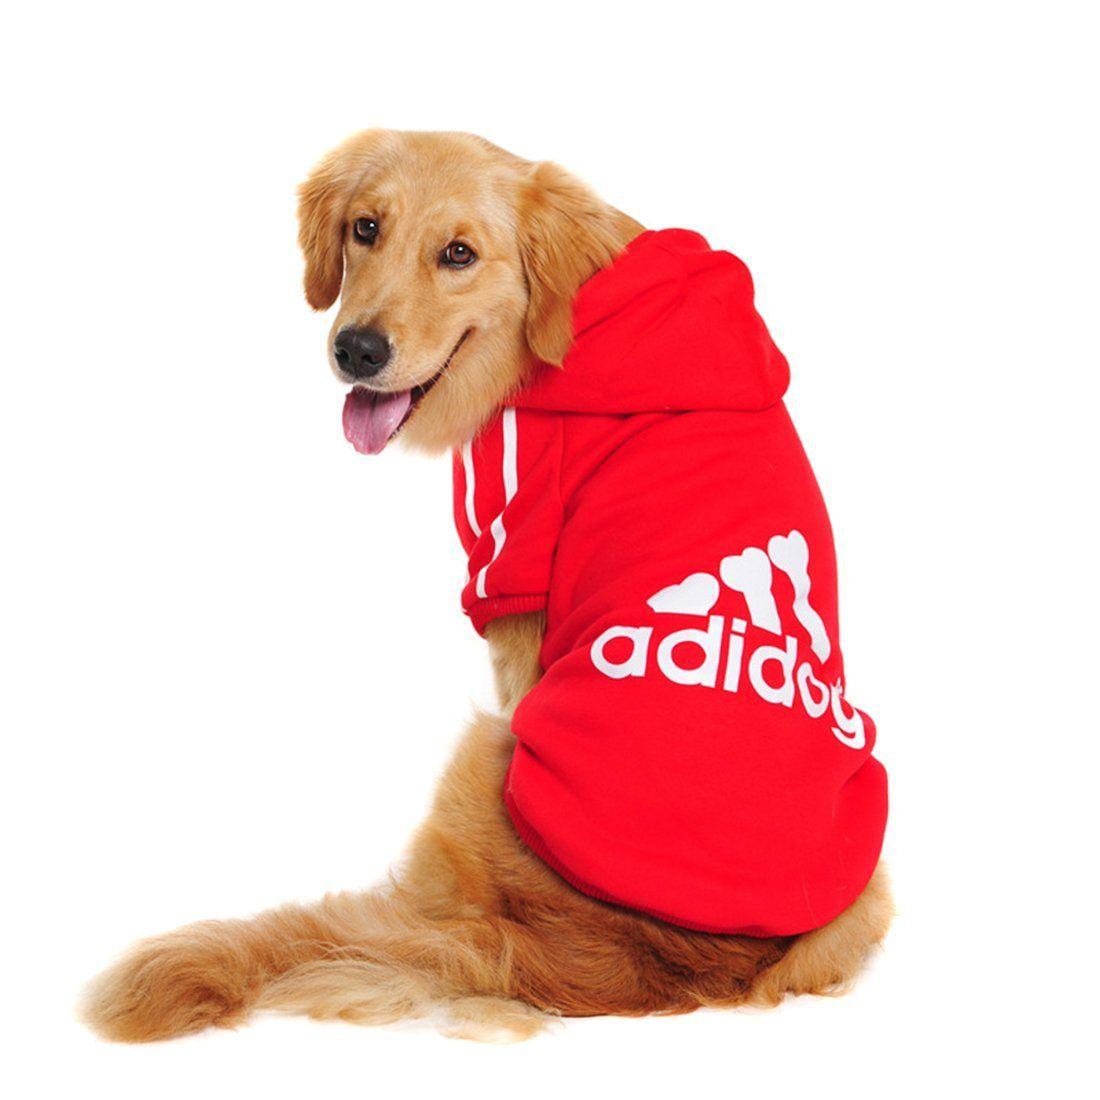 4650cd54eb92 Großen Hund Kleidung Warme Wintermantel Jacke Kleidung für Hunde Large Size Golden  Retriever Labrador 3XL-9XL Adidog Hoodie. Big Dog Clothes ...